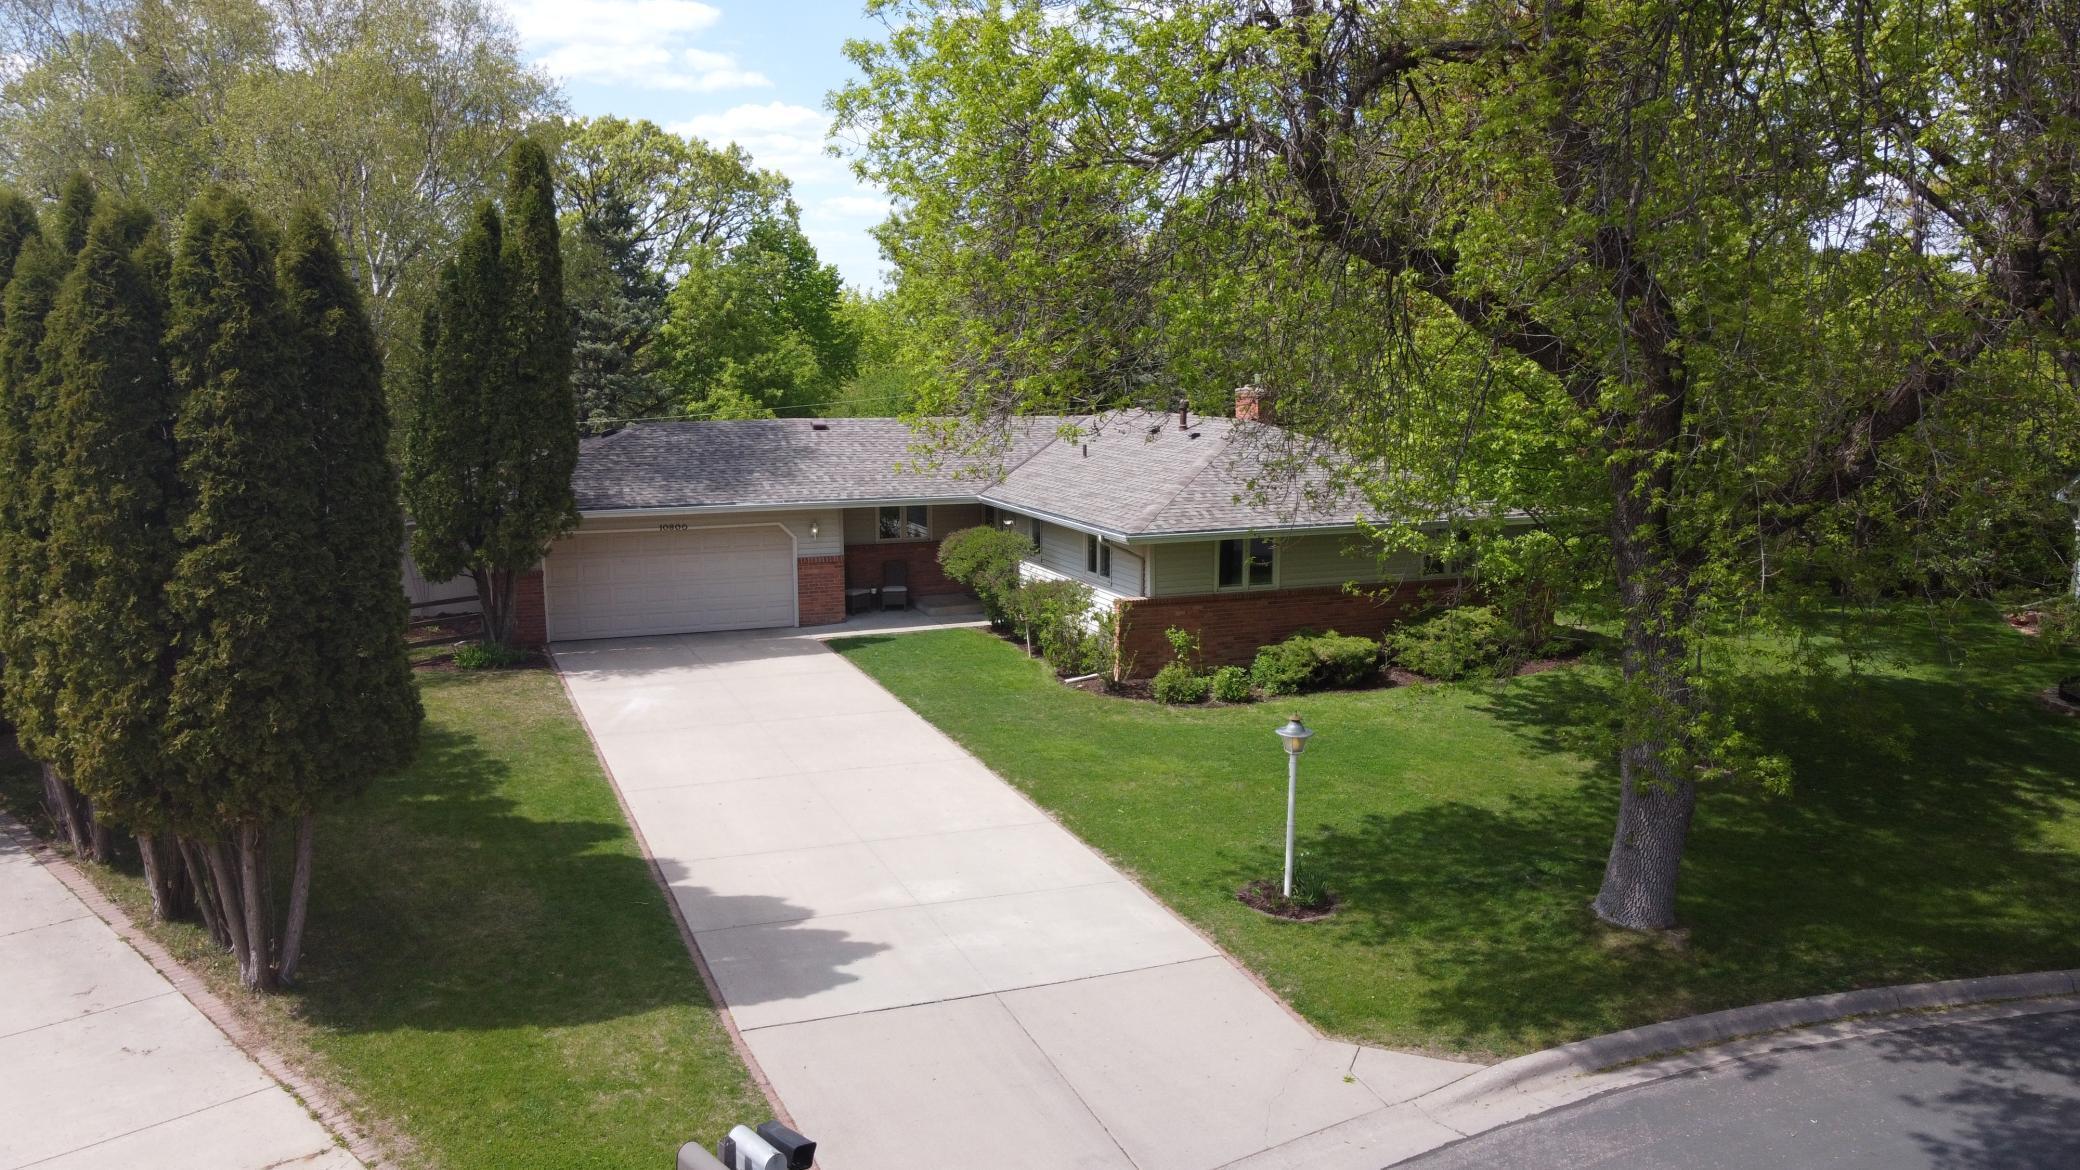 10800 Hayes Drive, Burnsville MN 55337 - Photo 2